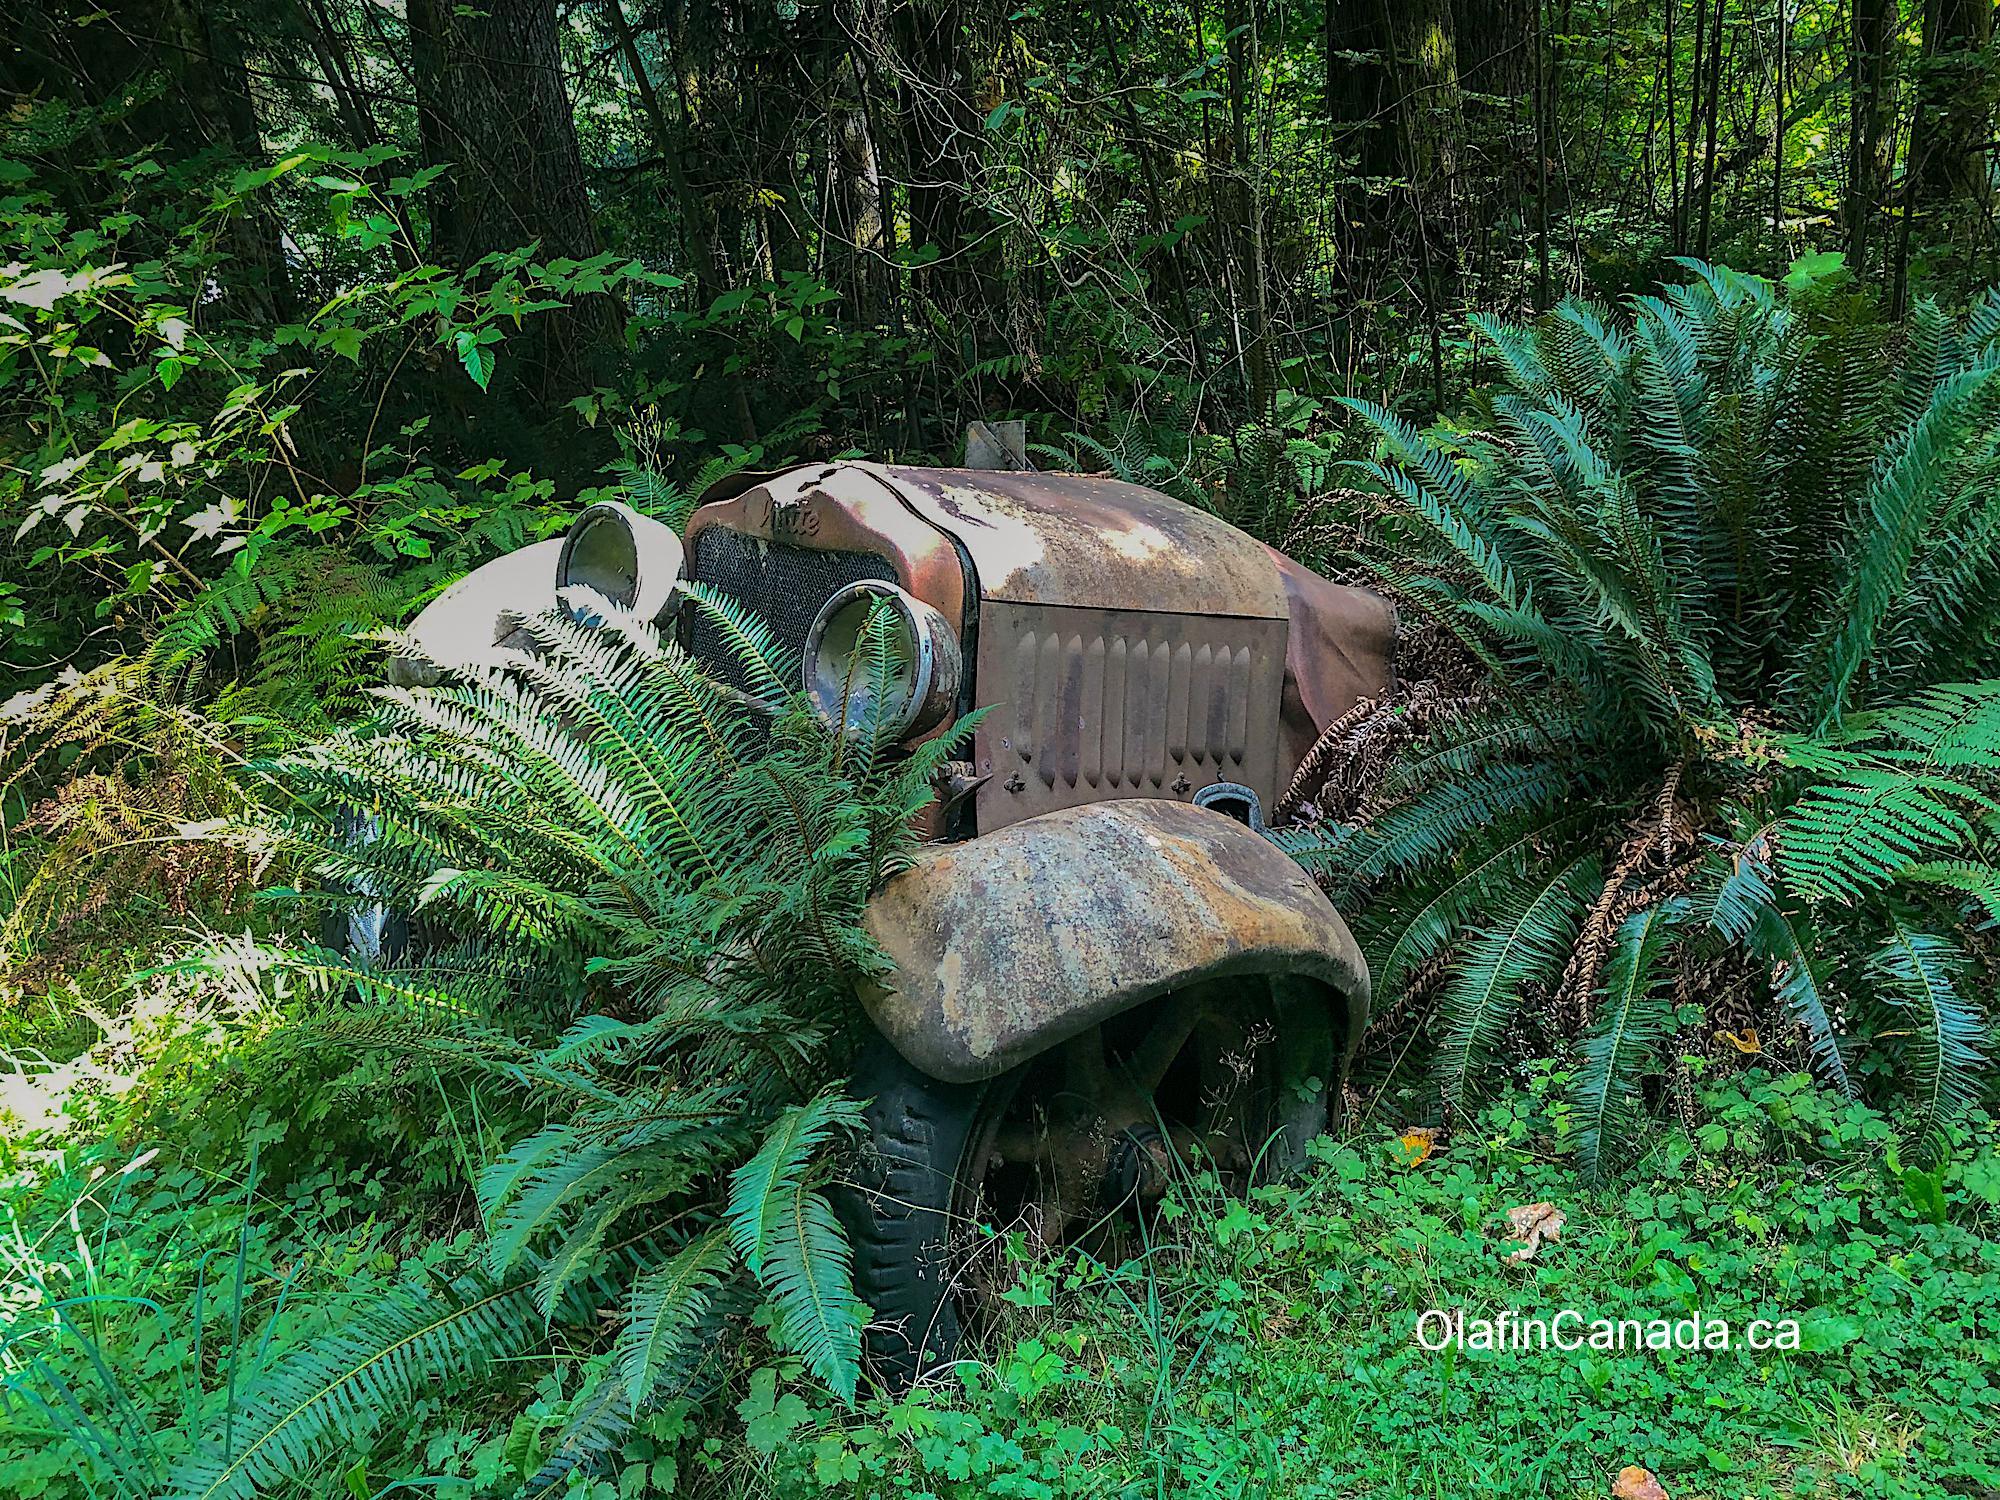 Old car near Sayward junction Vancouver Island #olafincanada #britishcolumbia #discoverbc #abandonedbc #vancouverisland #car